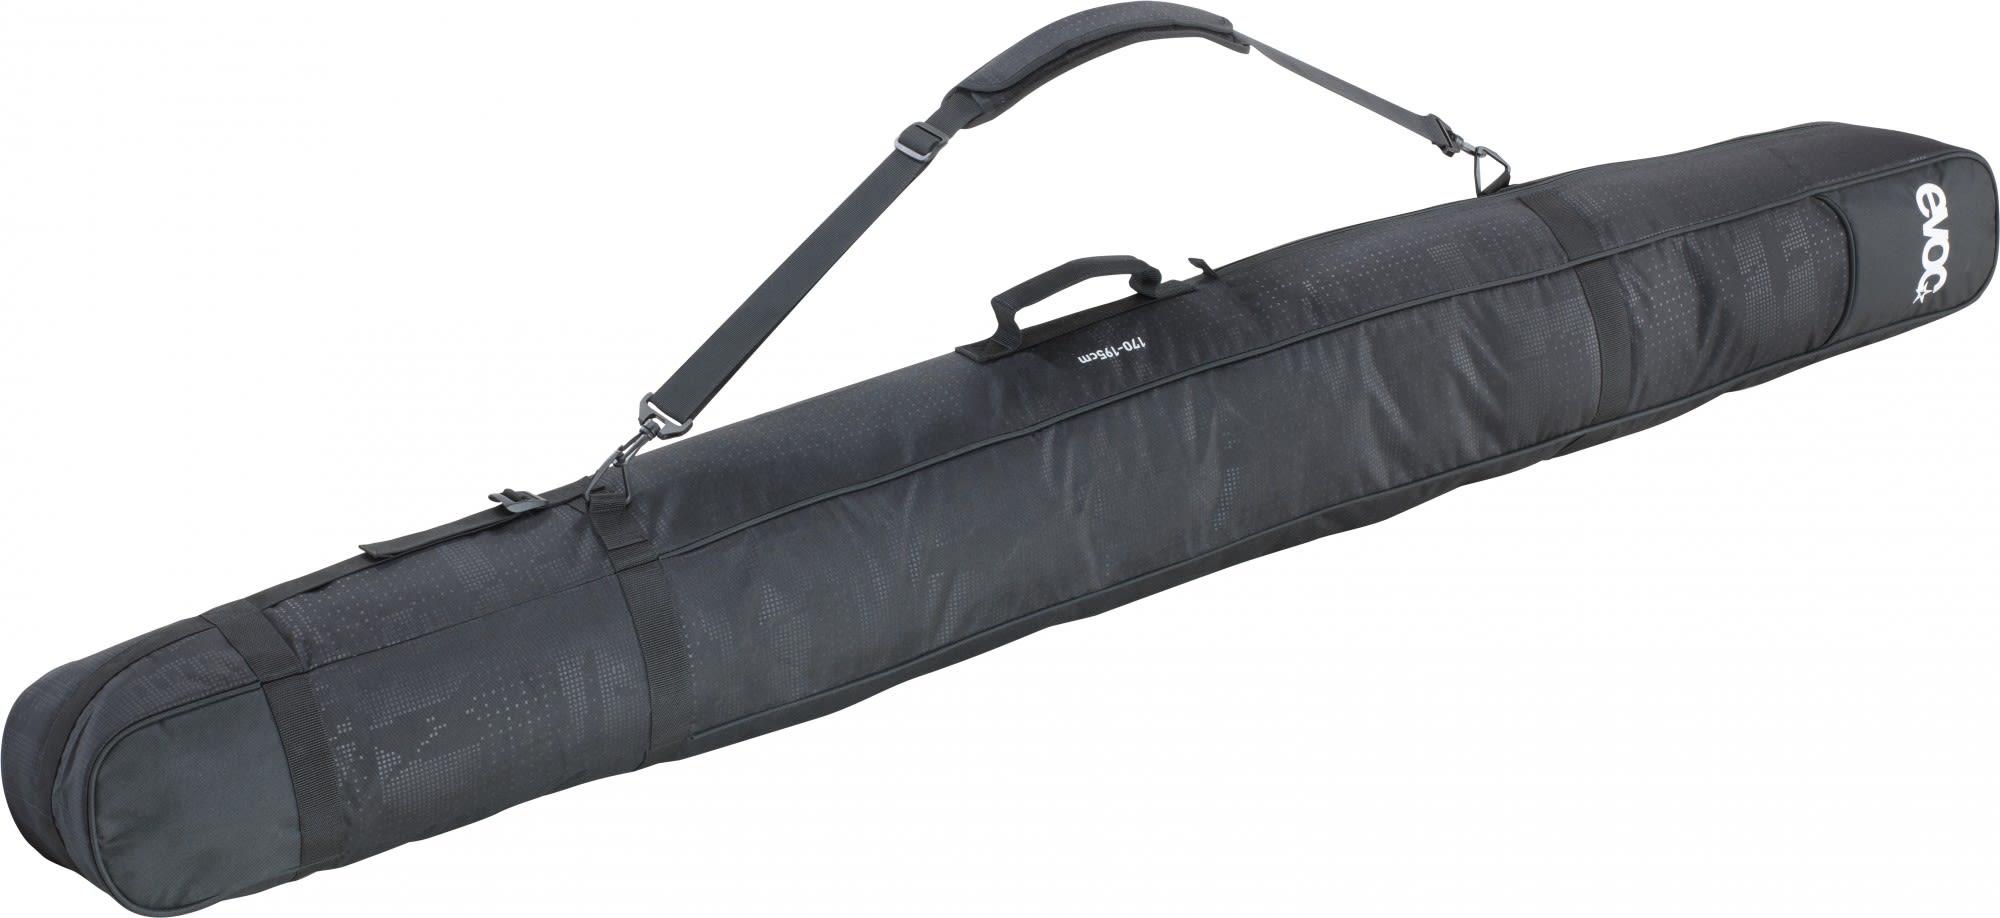 Evoc Ski Bag Schwarz, Taschen, 50l